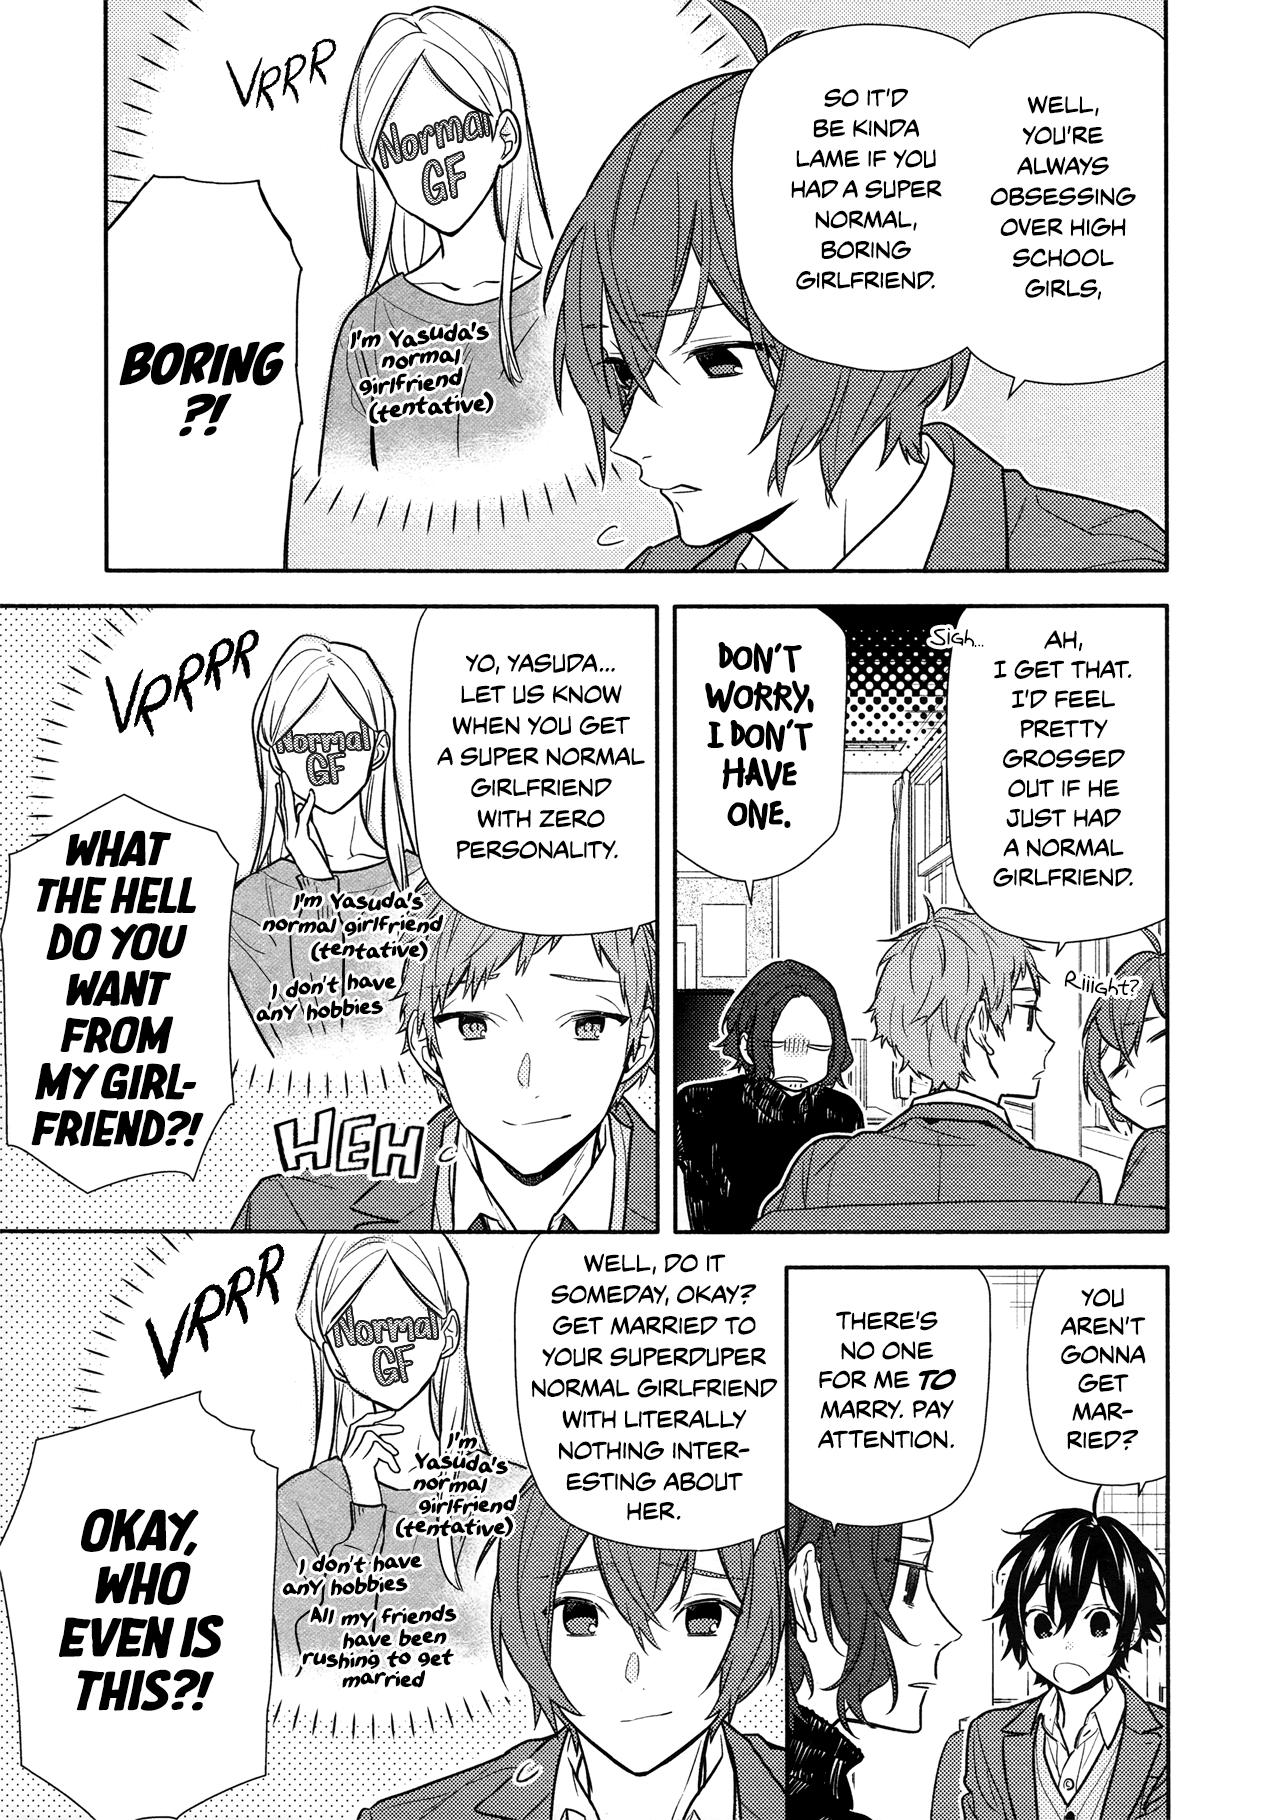 Horimiya, Chapter 112 Page 3